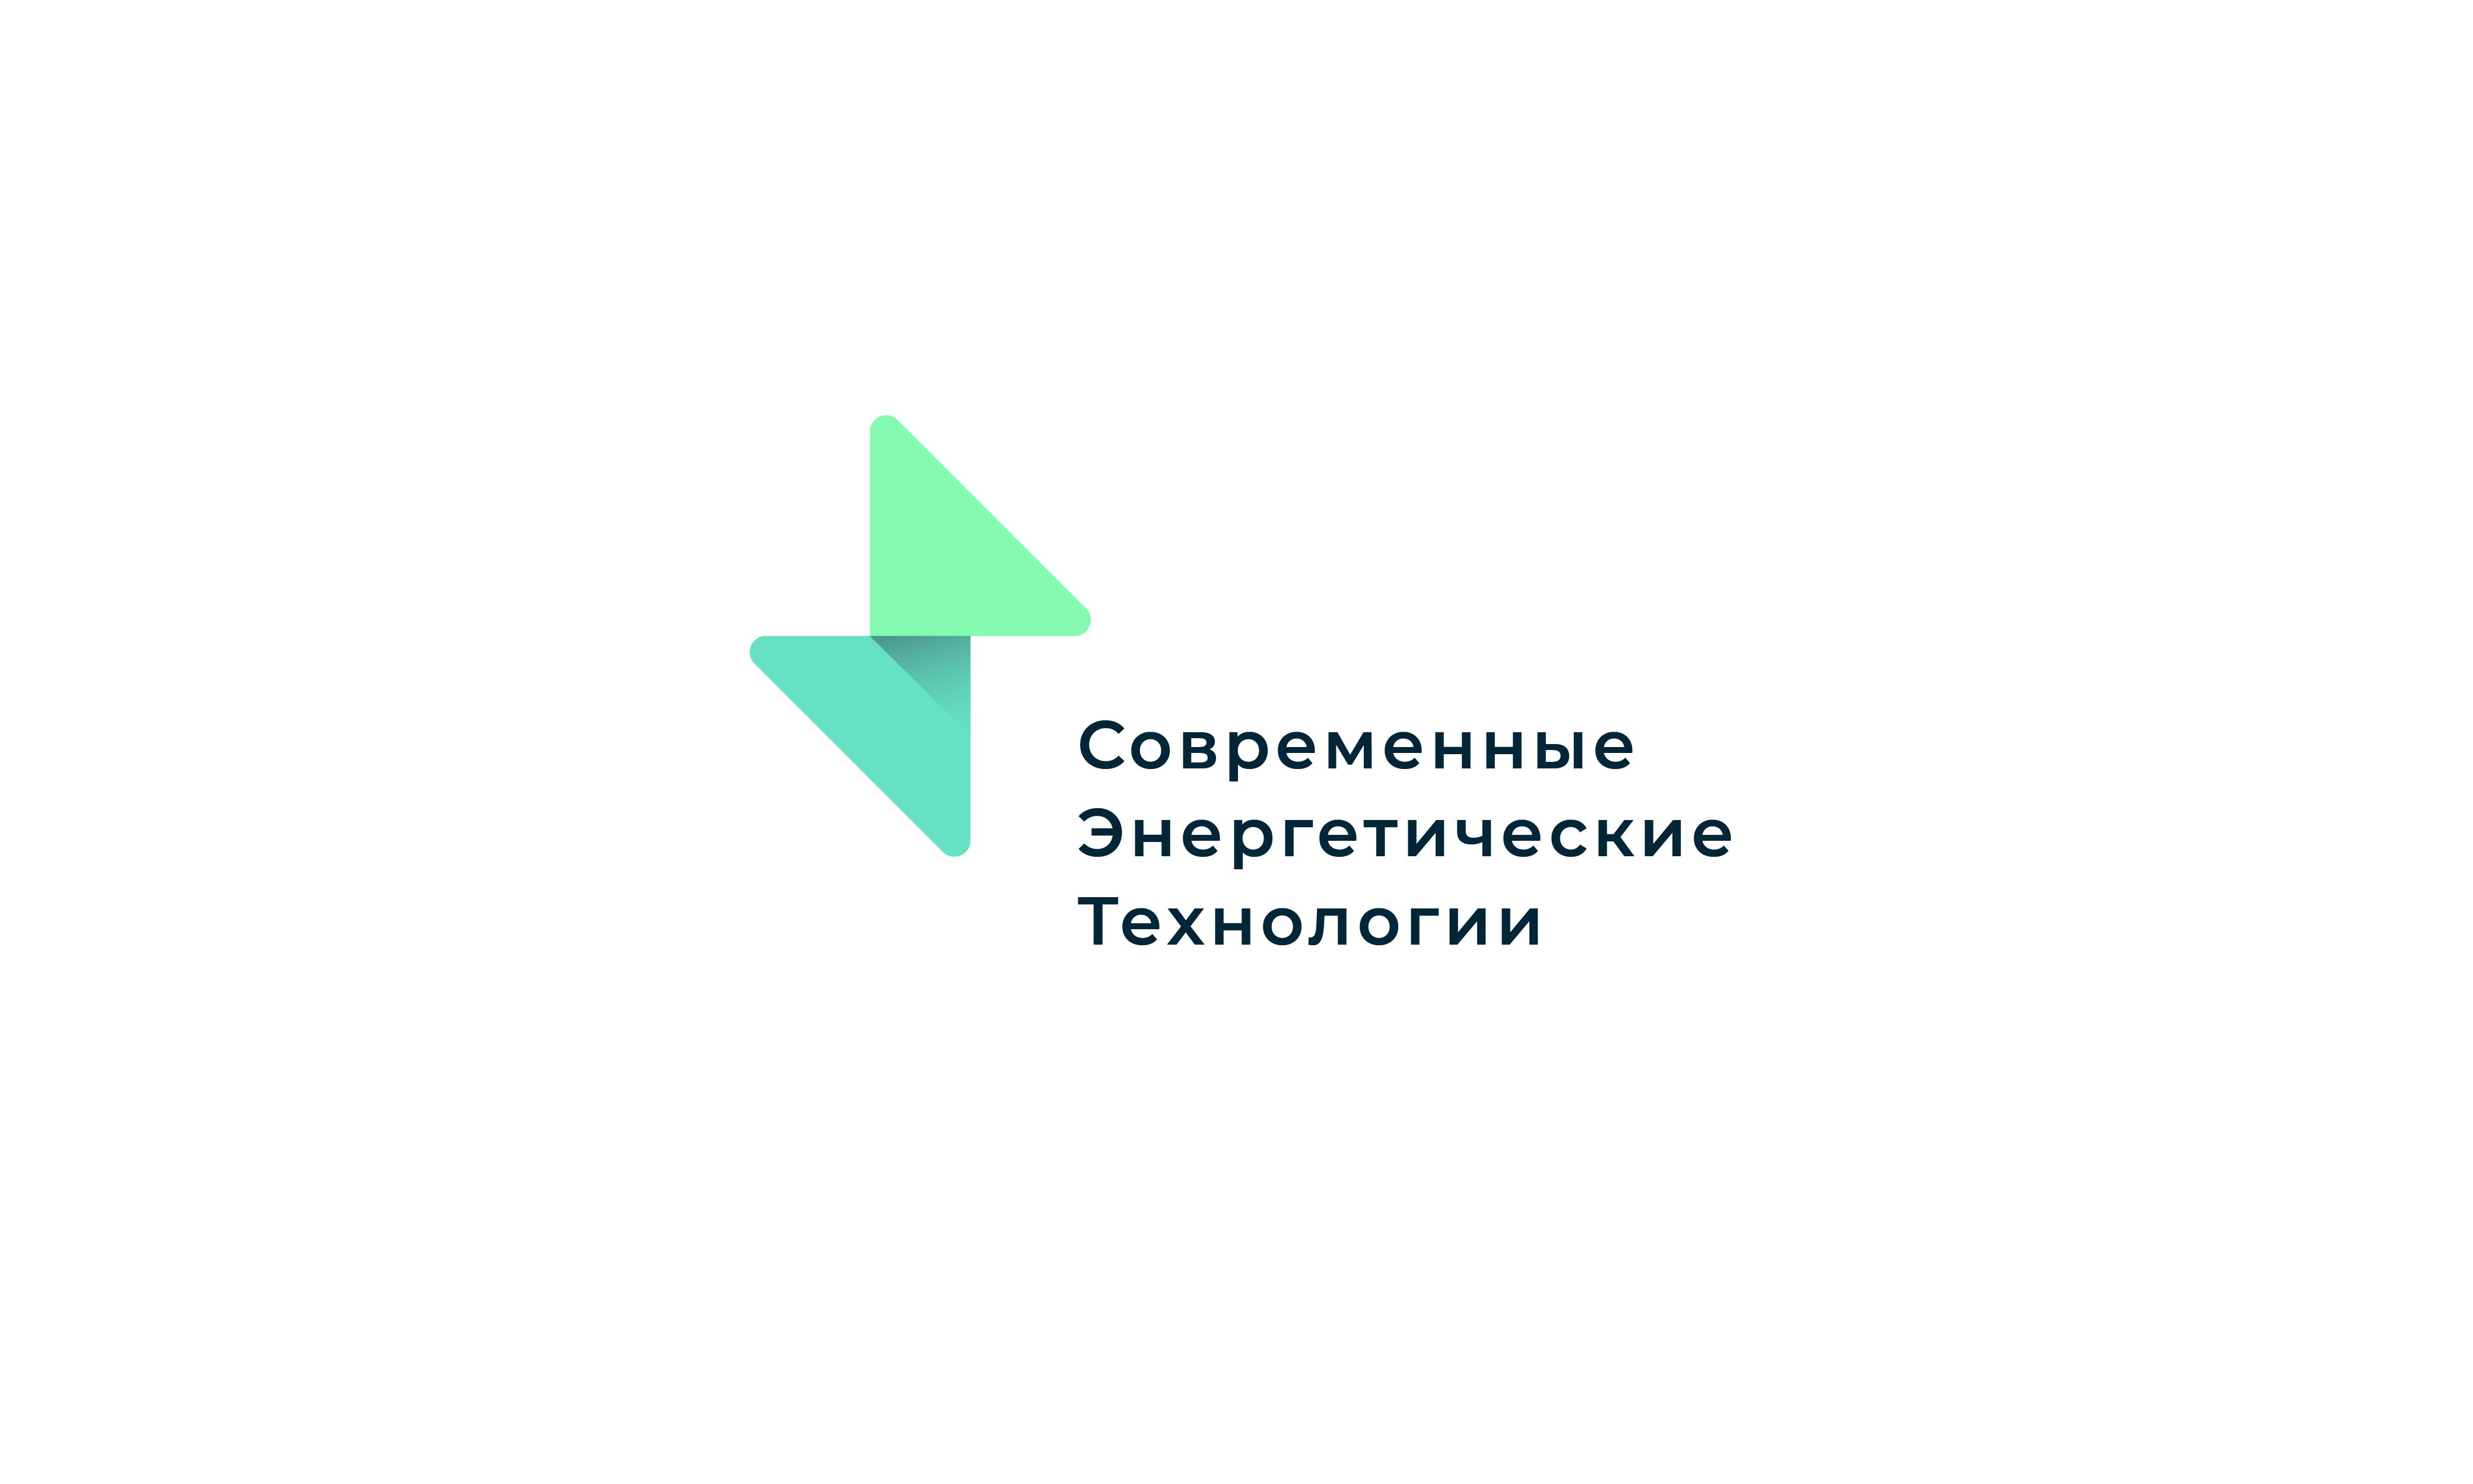 Срочно! Дизайн логотипа ООО «СЭТ» фото f_0665d4eb5422a212.jpg